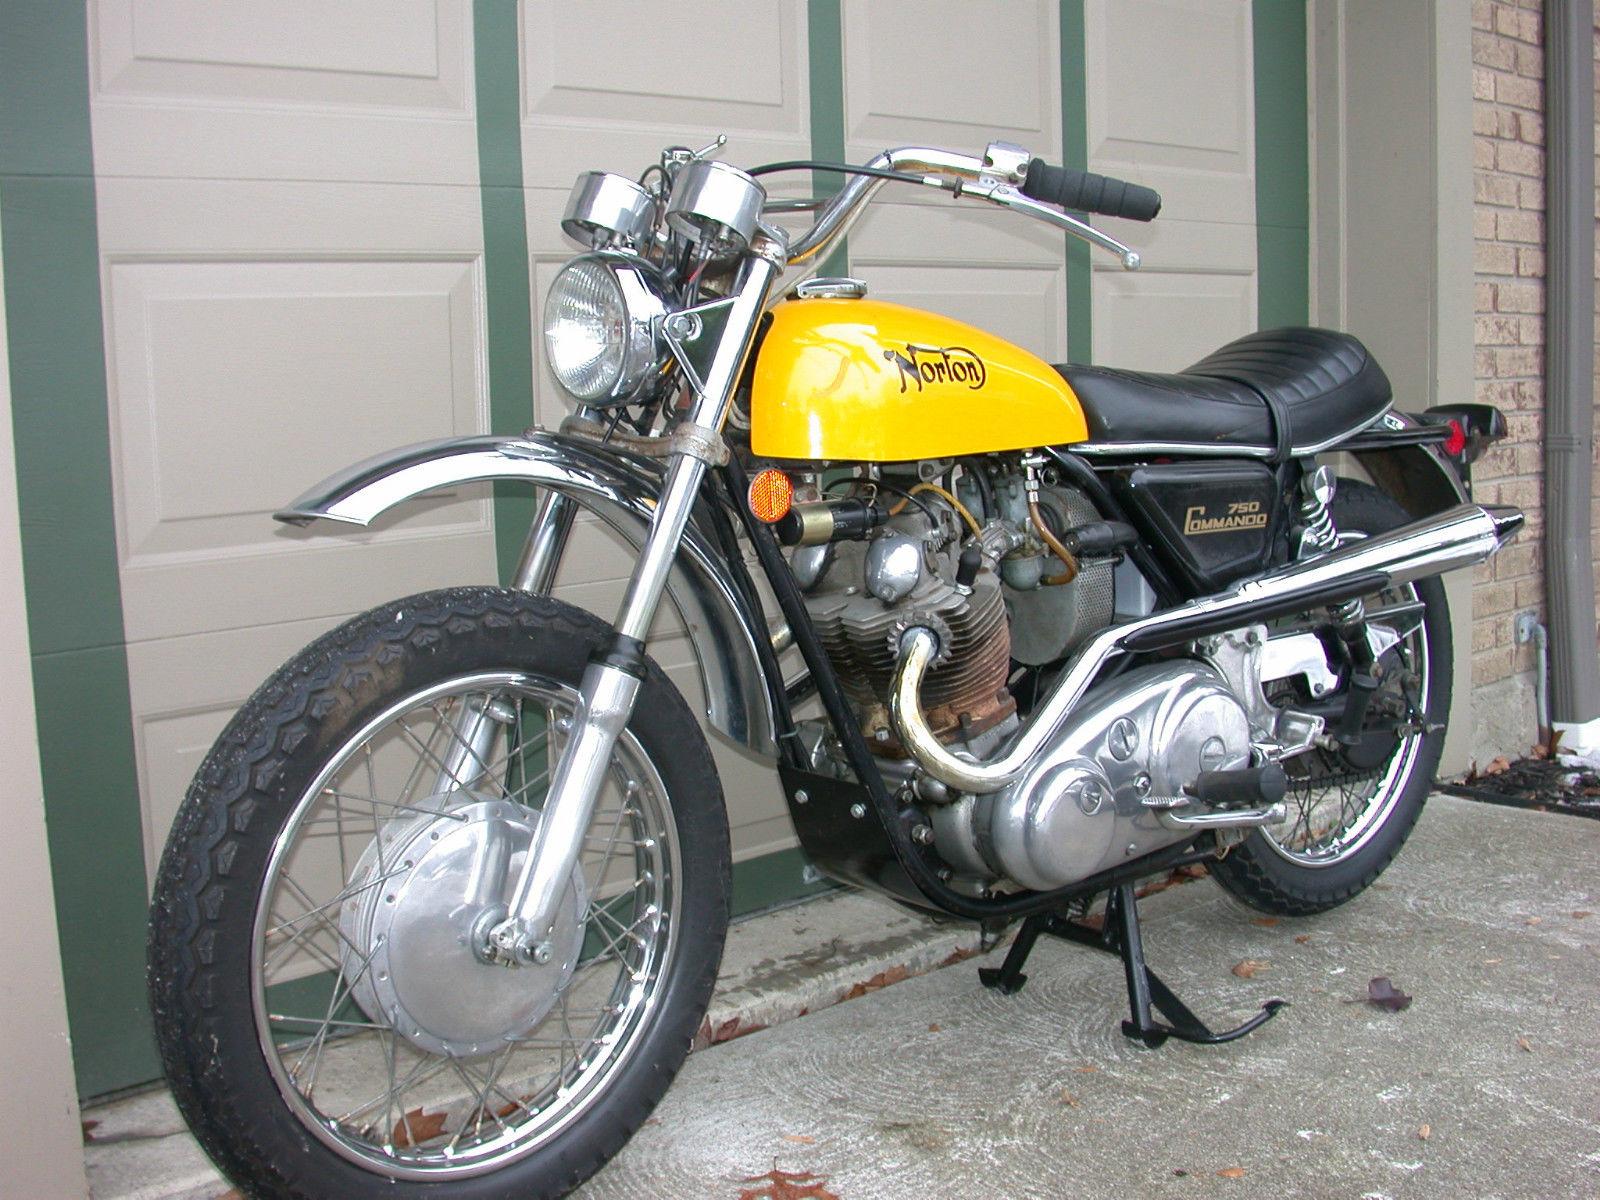 Street Scrambler – 1971 Norton Commando SS